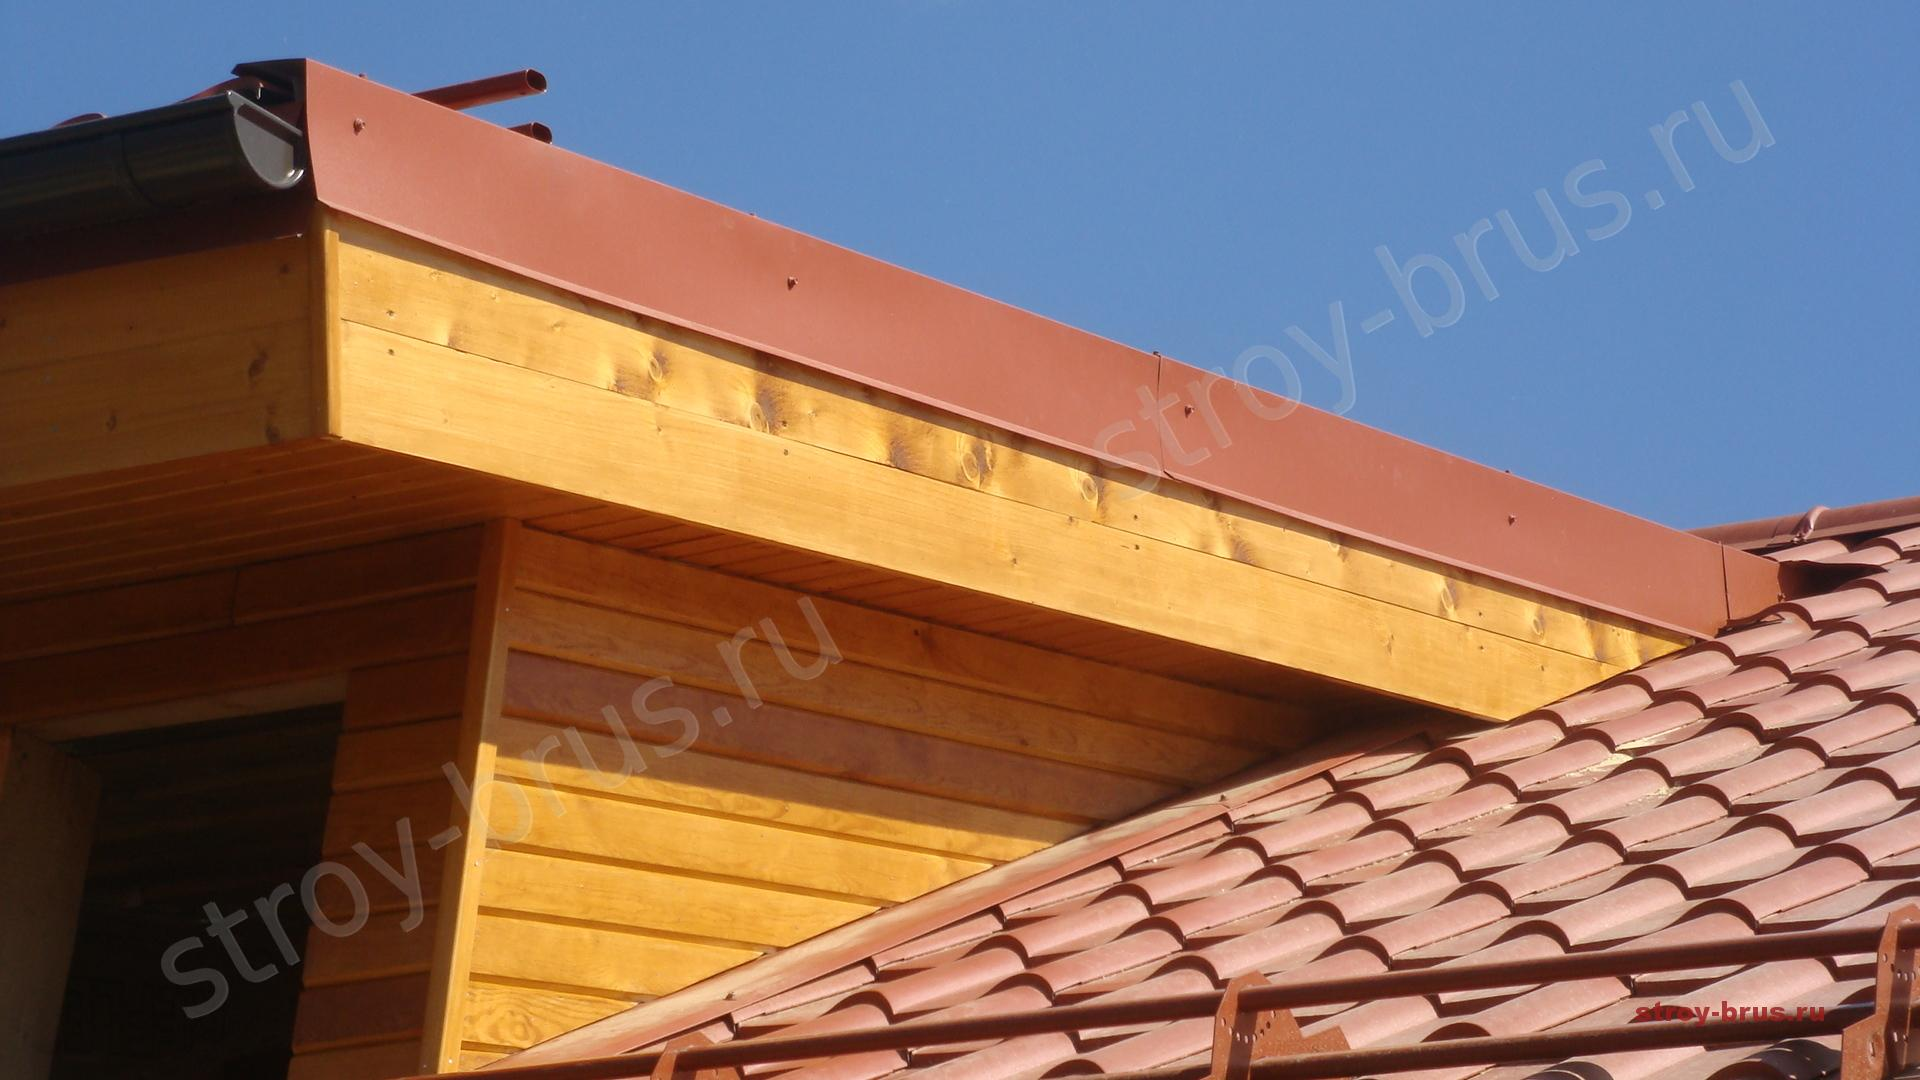 Отделка слухового окна на крыше дома.